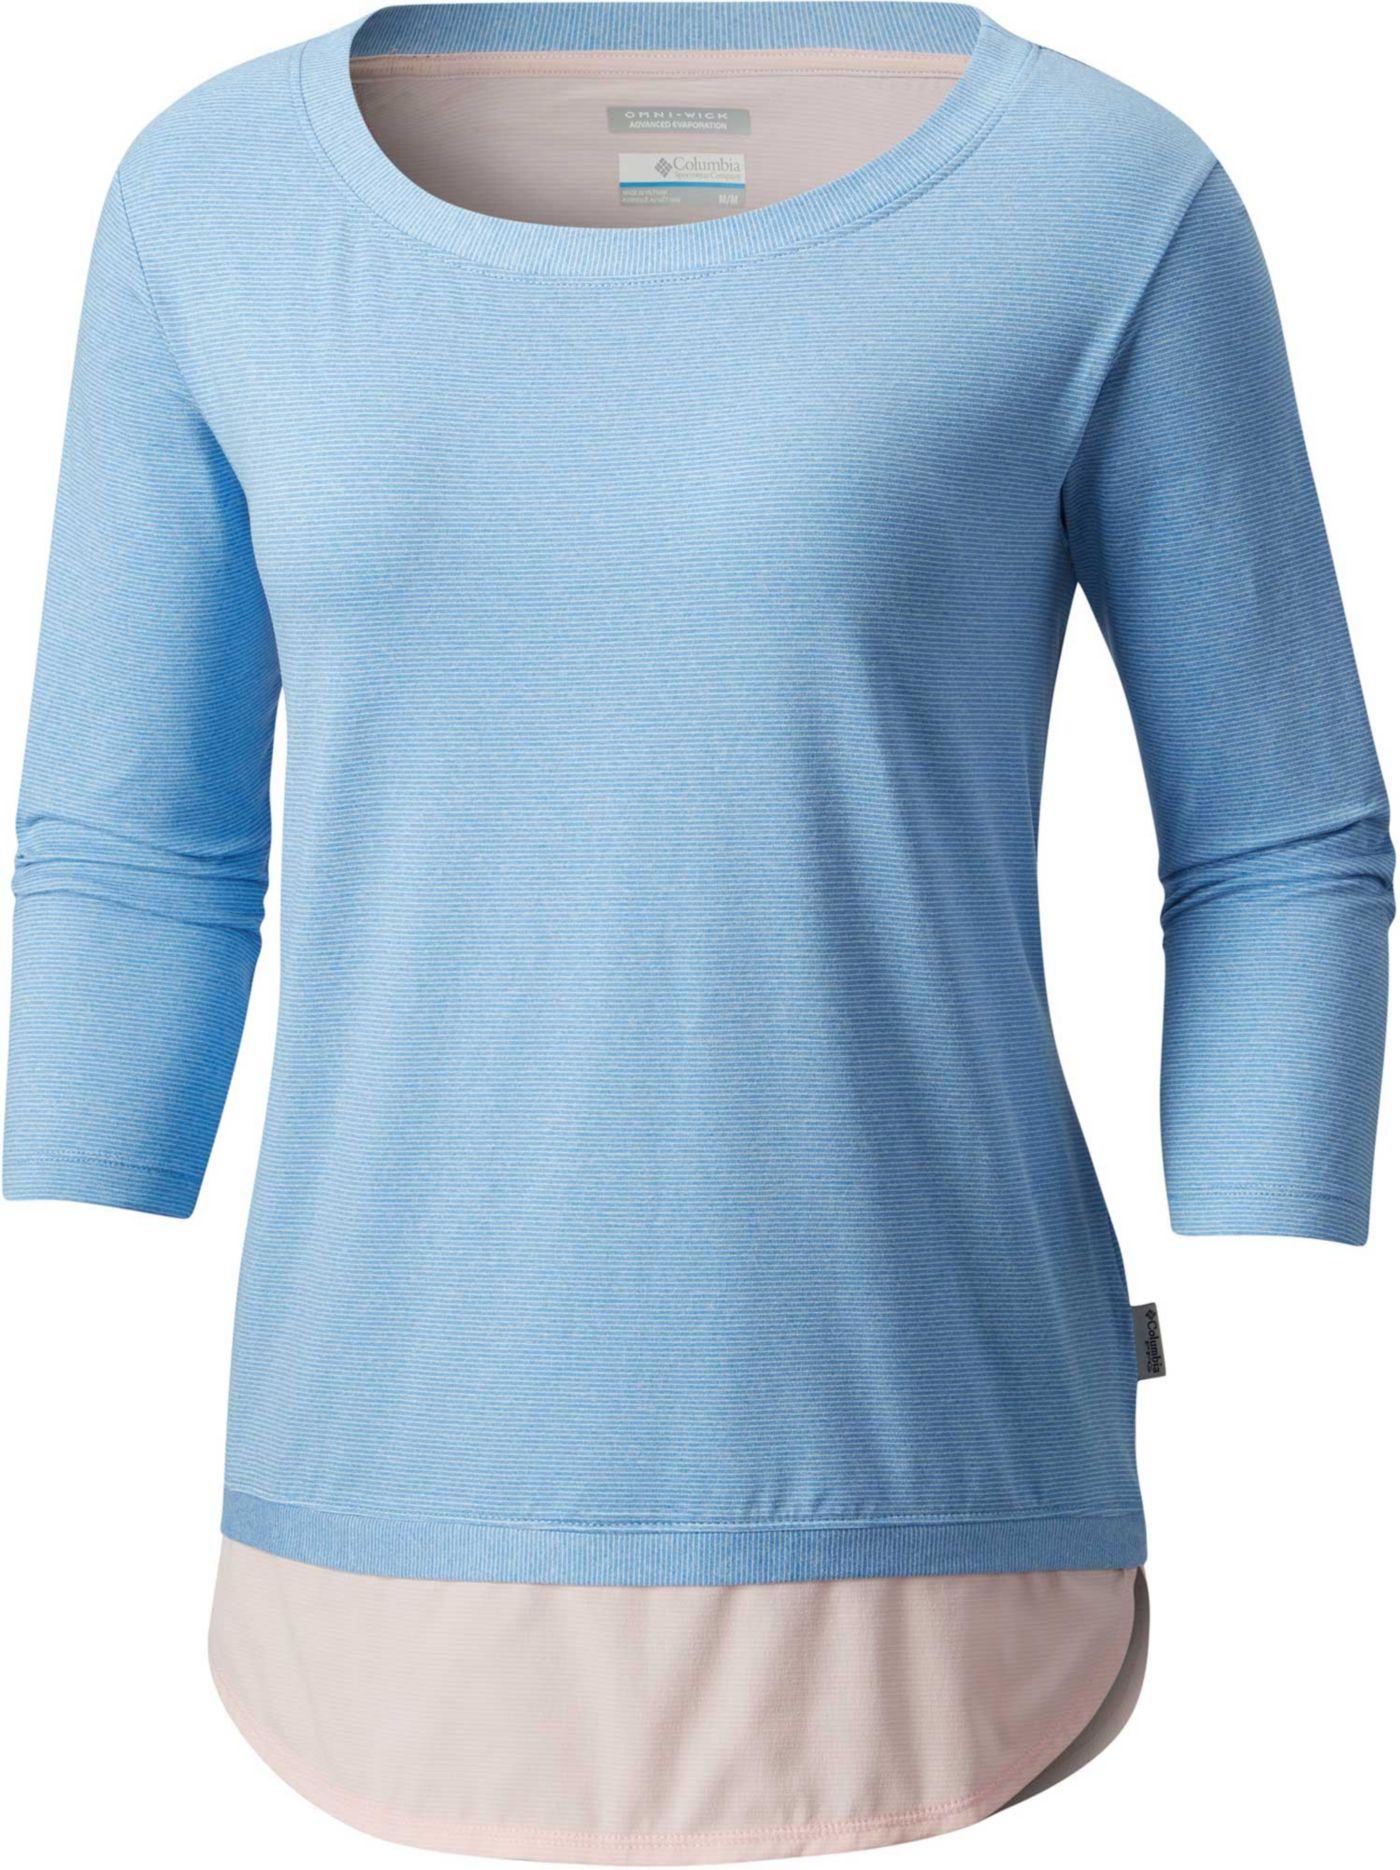 Columbia Women's PFG Reel Relaxed ¾ Sleeve Shirt